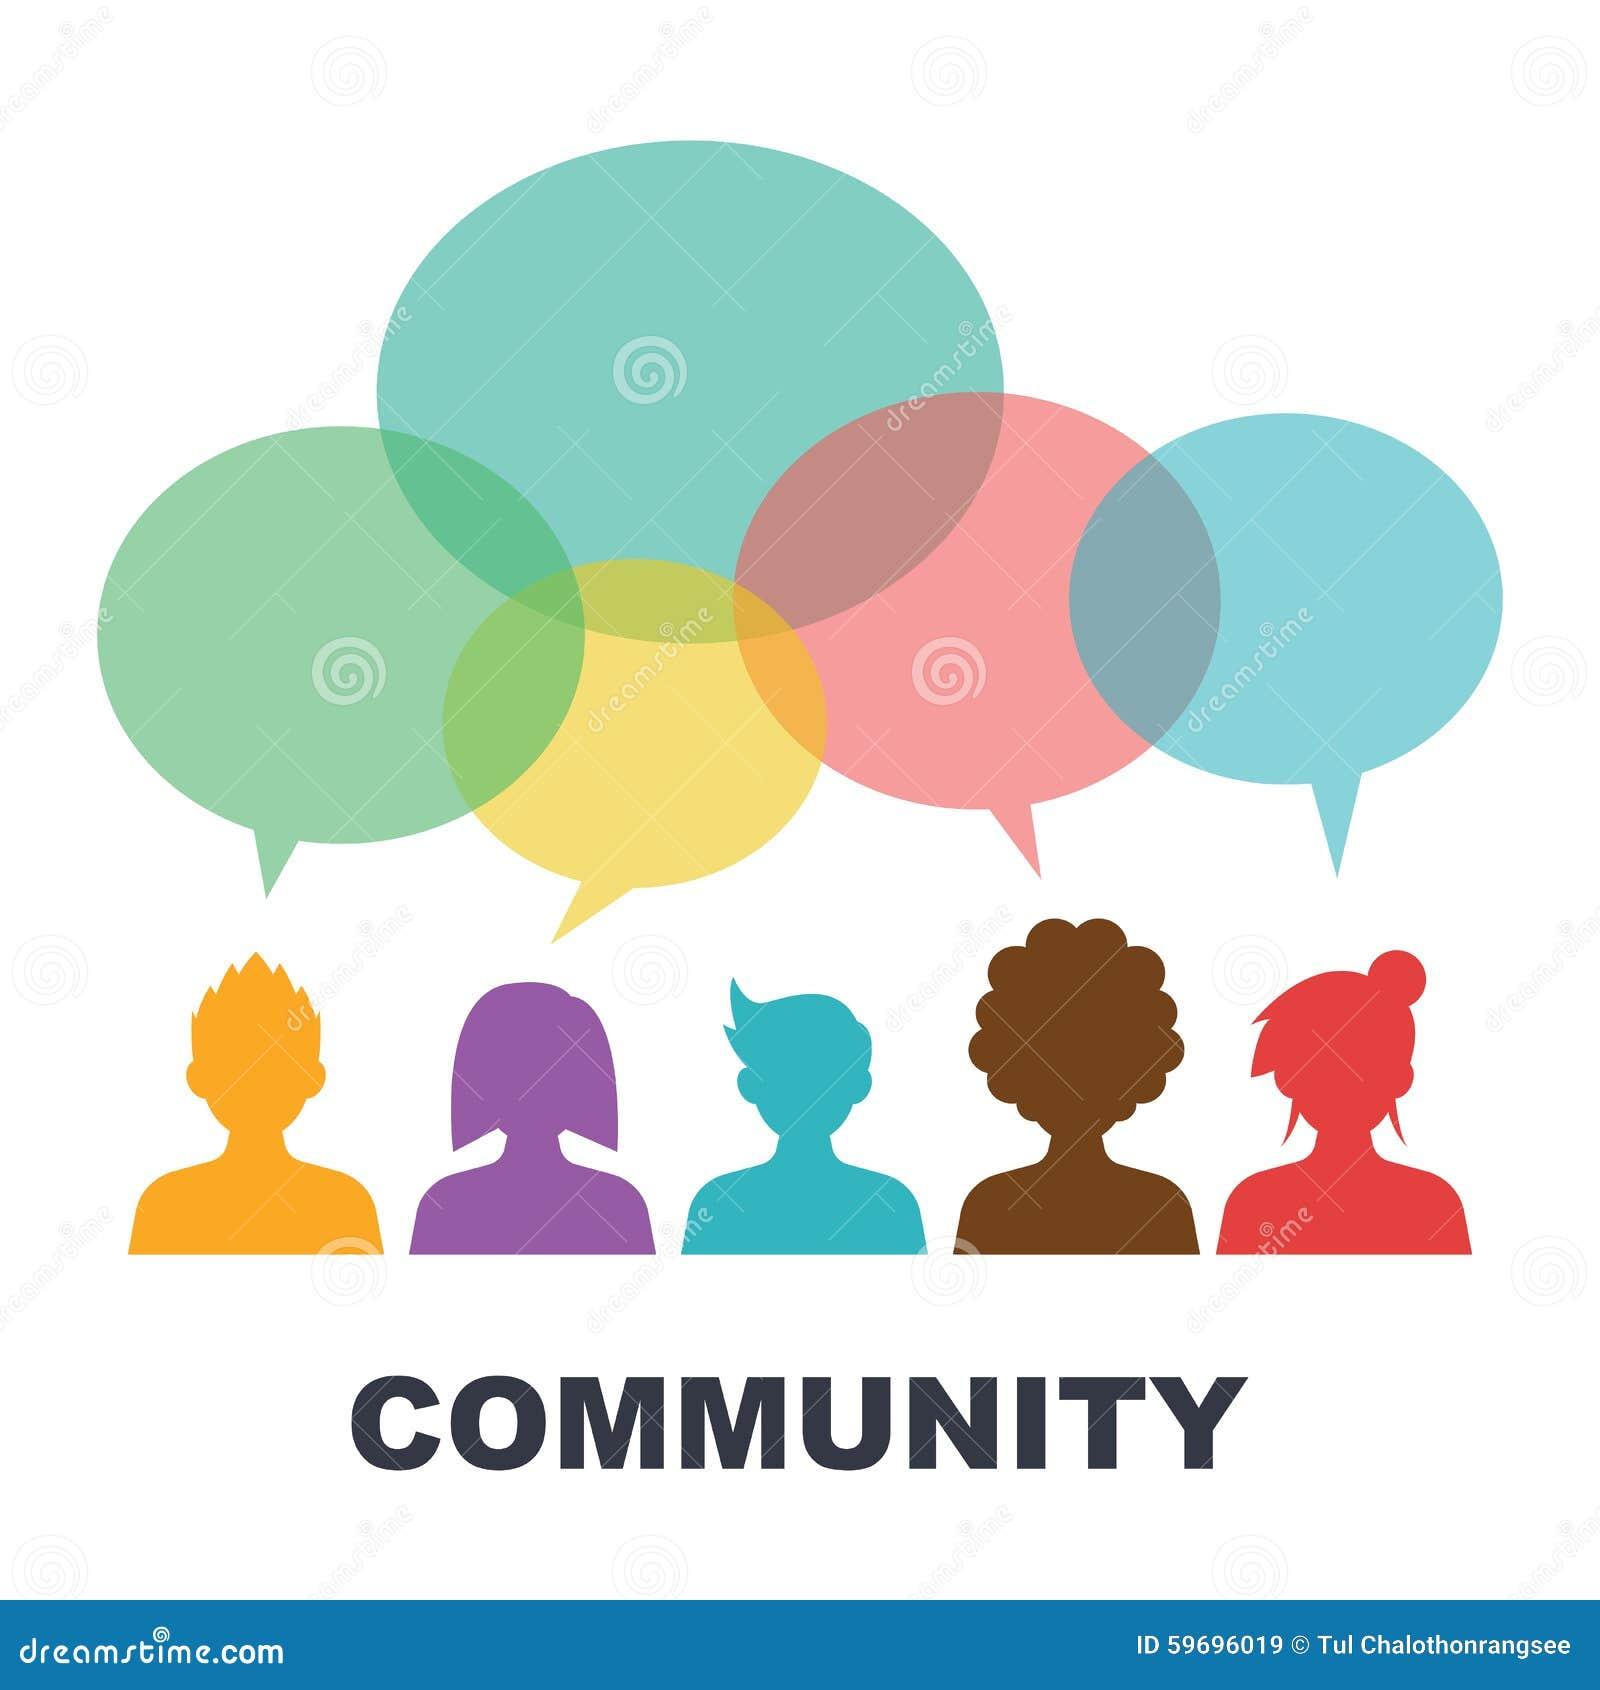 Social Community Stock Vector - Image: 59696019